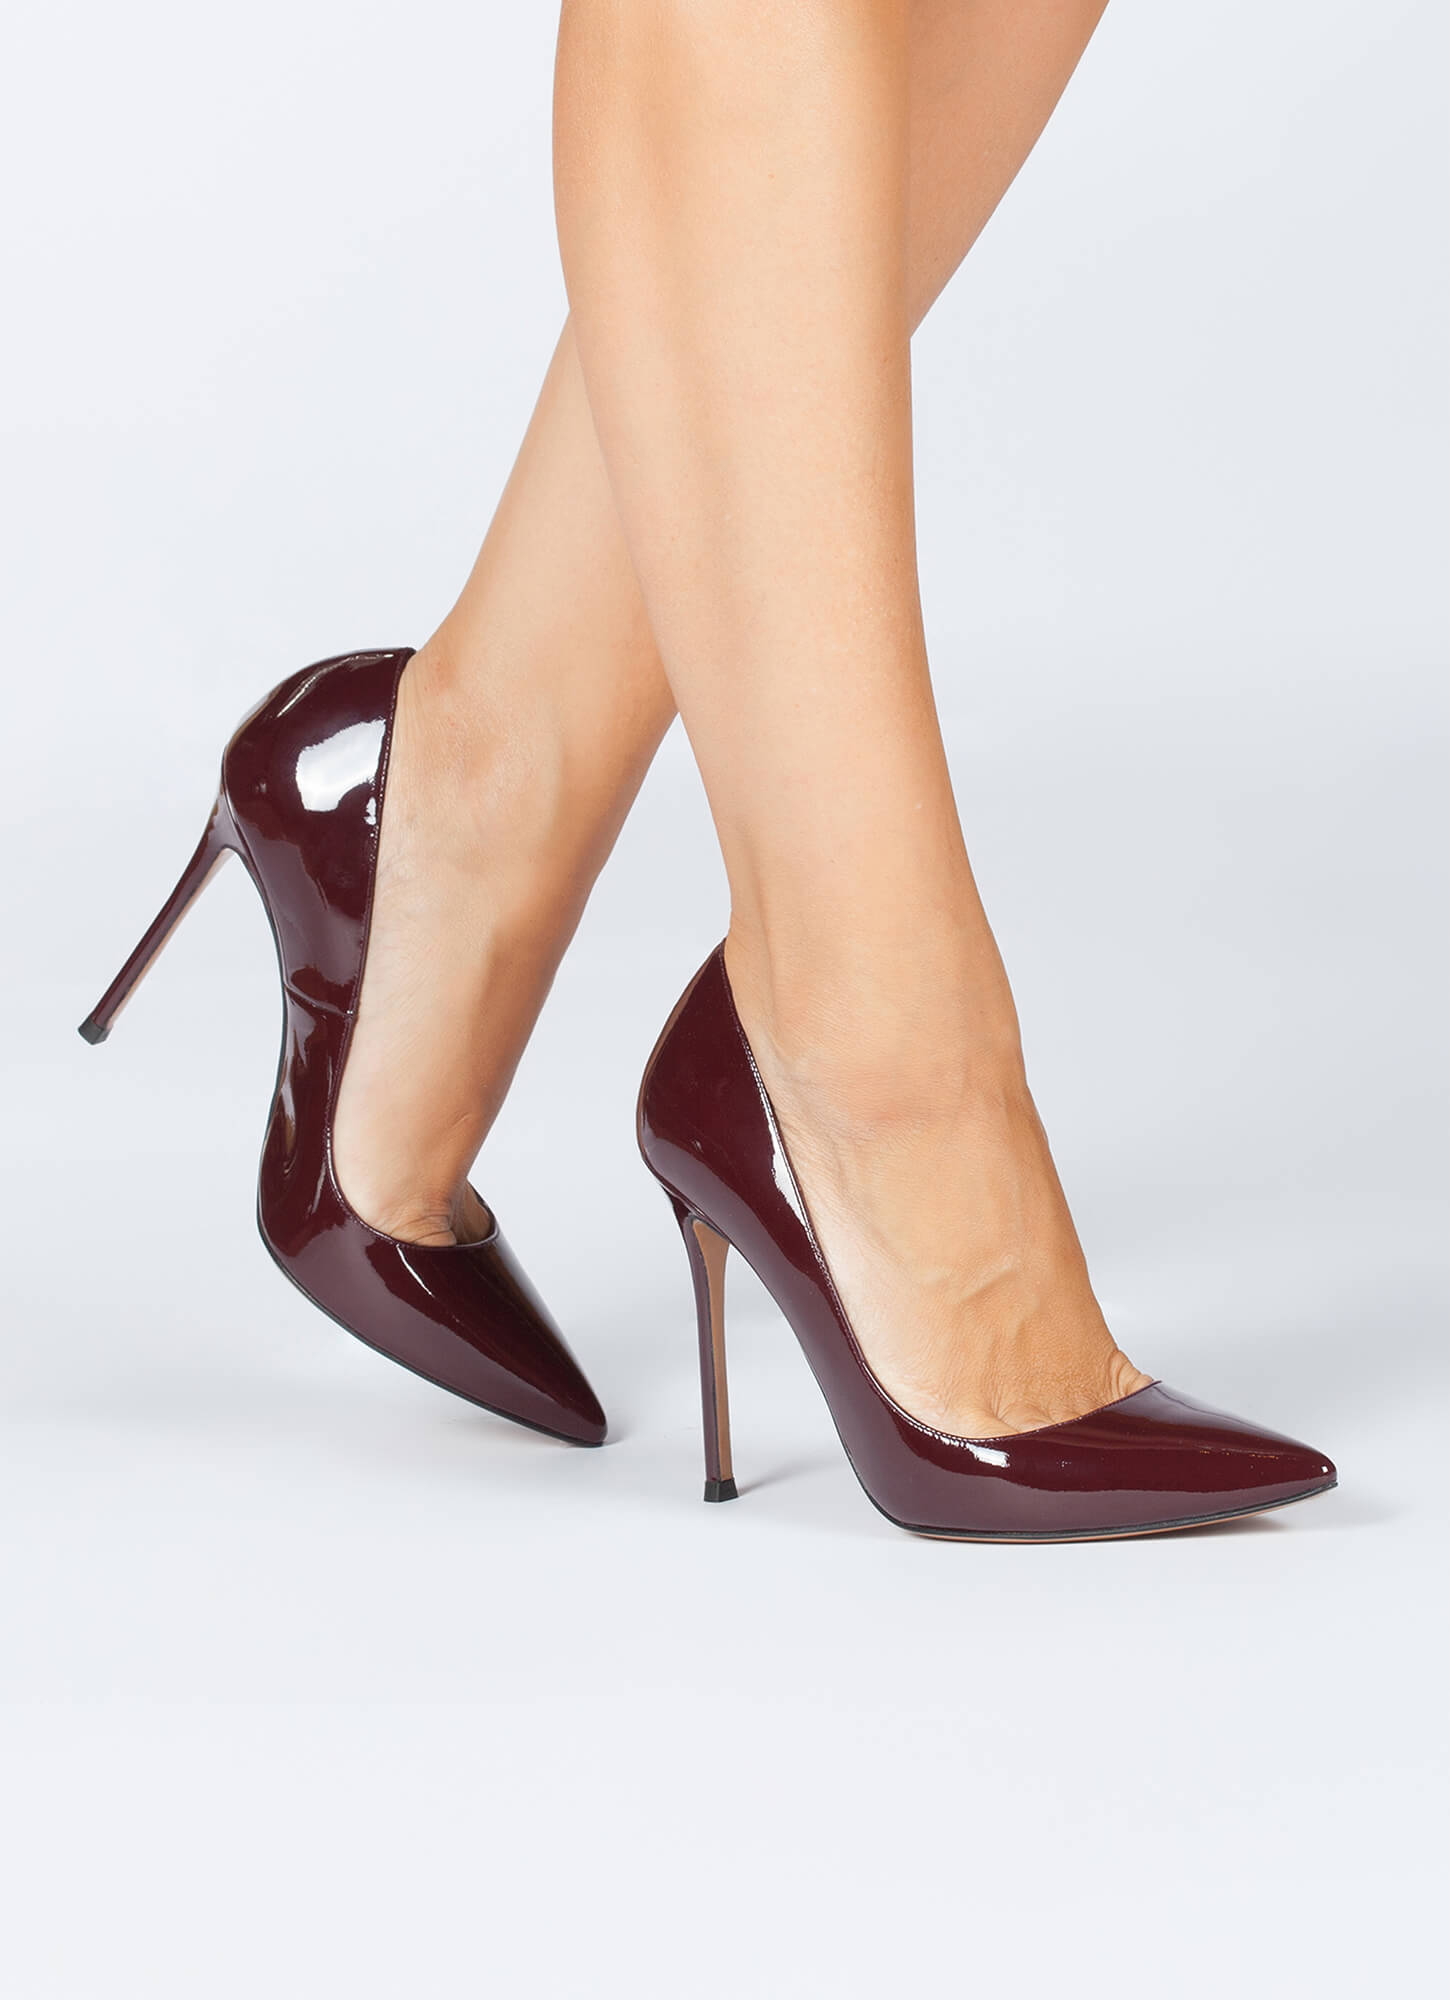 123eb0b08 Kameron icons Pura López. High heel pumps in burgundy patent leather High  heel pointy toe pumps in burgundy patent leather ...